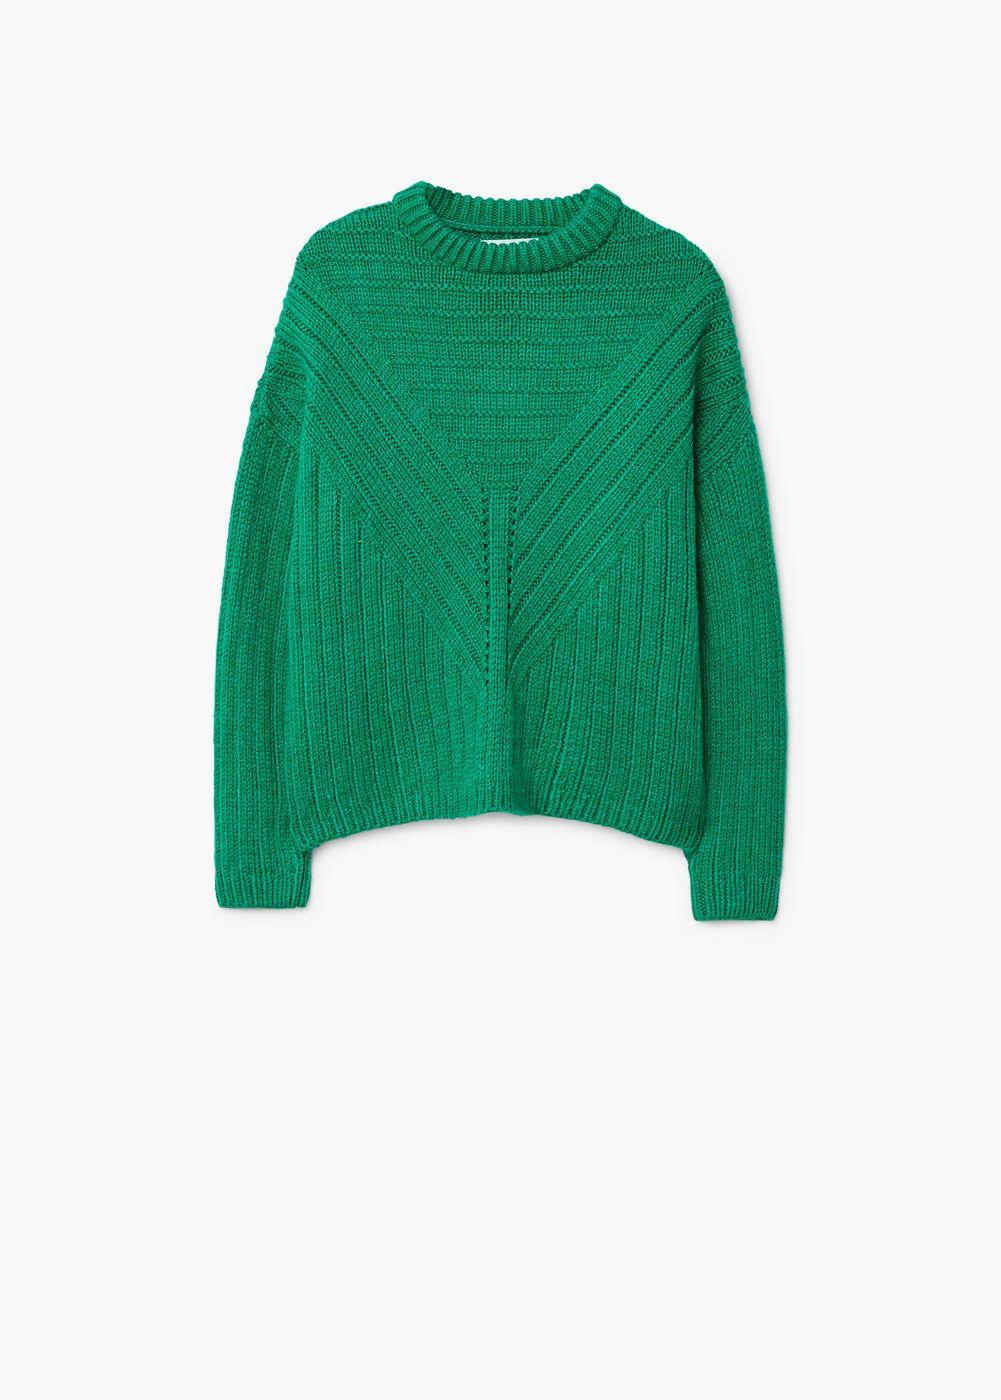 MANGO – Oversize-Pullover REF. 23010774 - VINTAGE